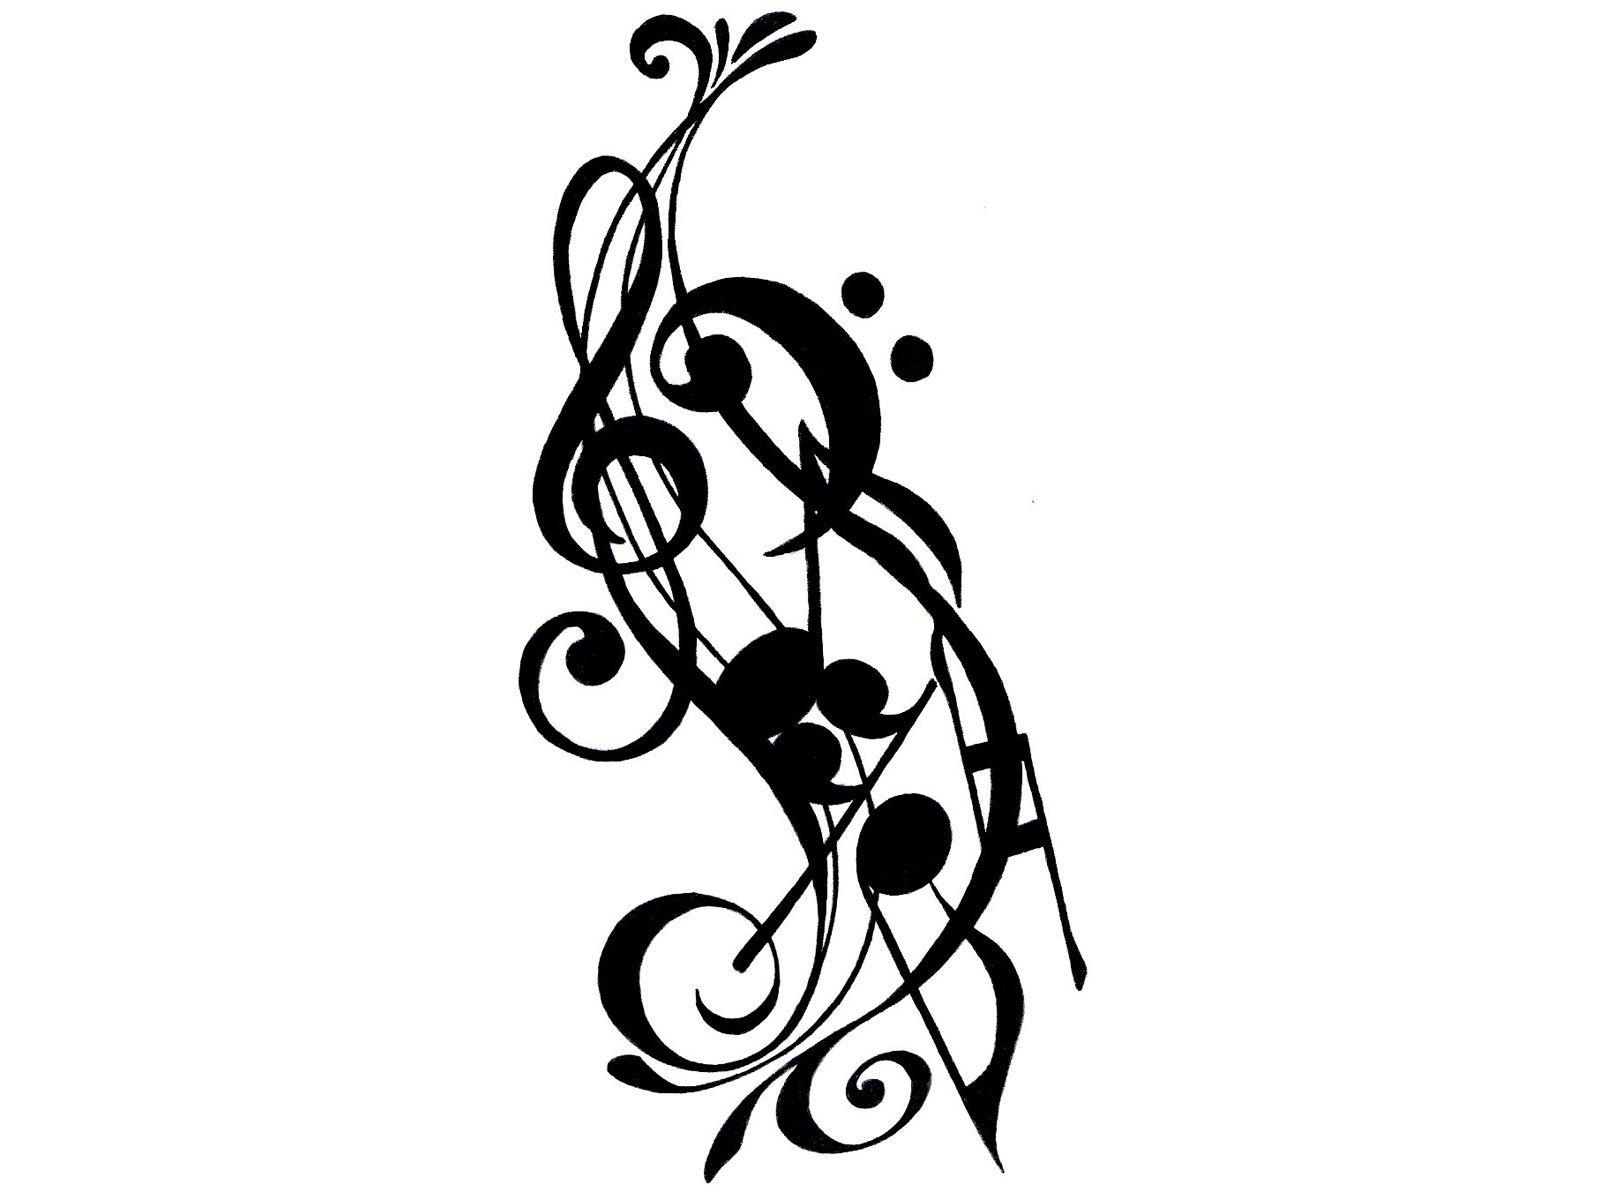 Music Notes Tattoos Pics Music Notes Tattoos Tattoos